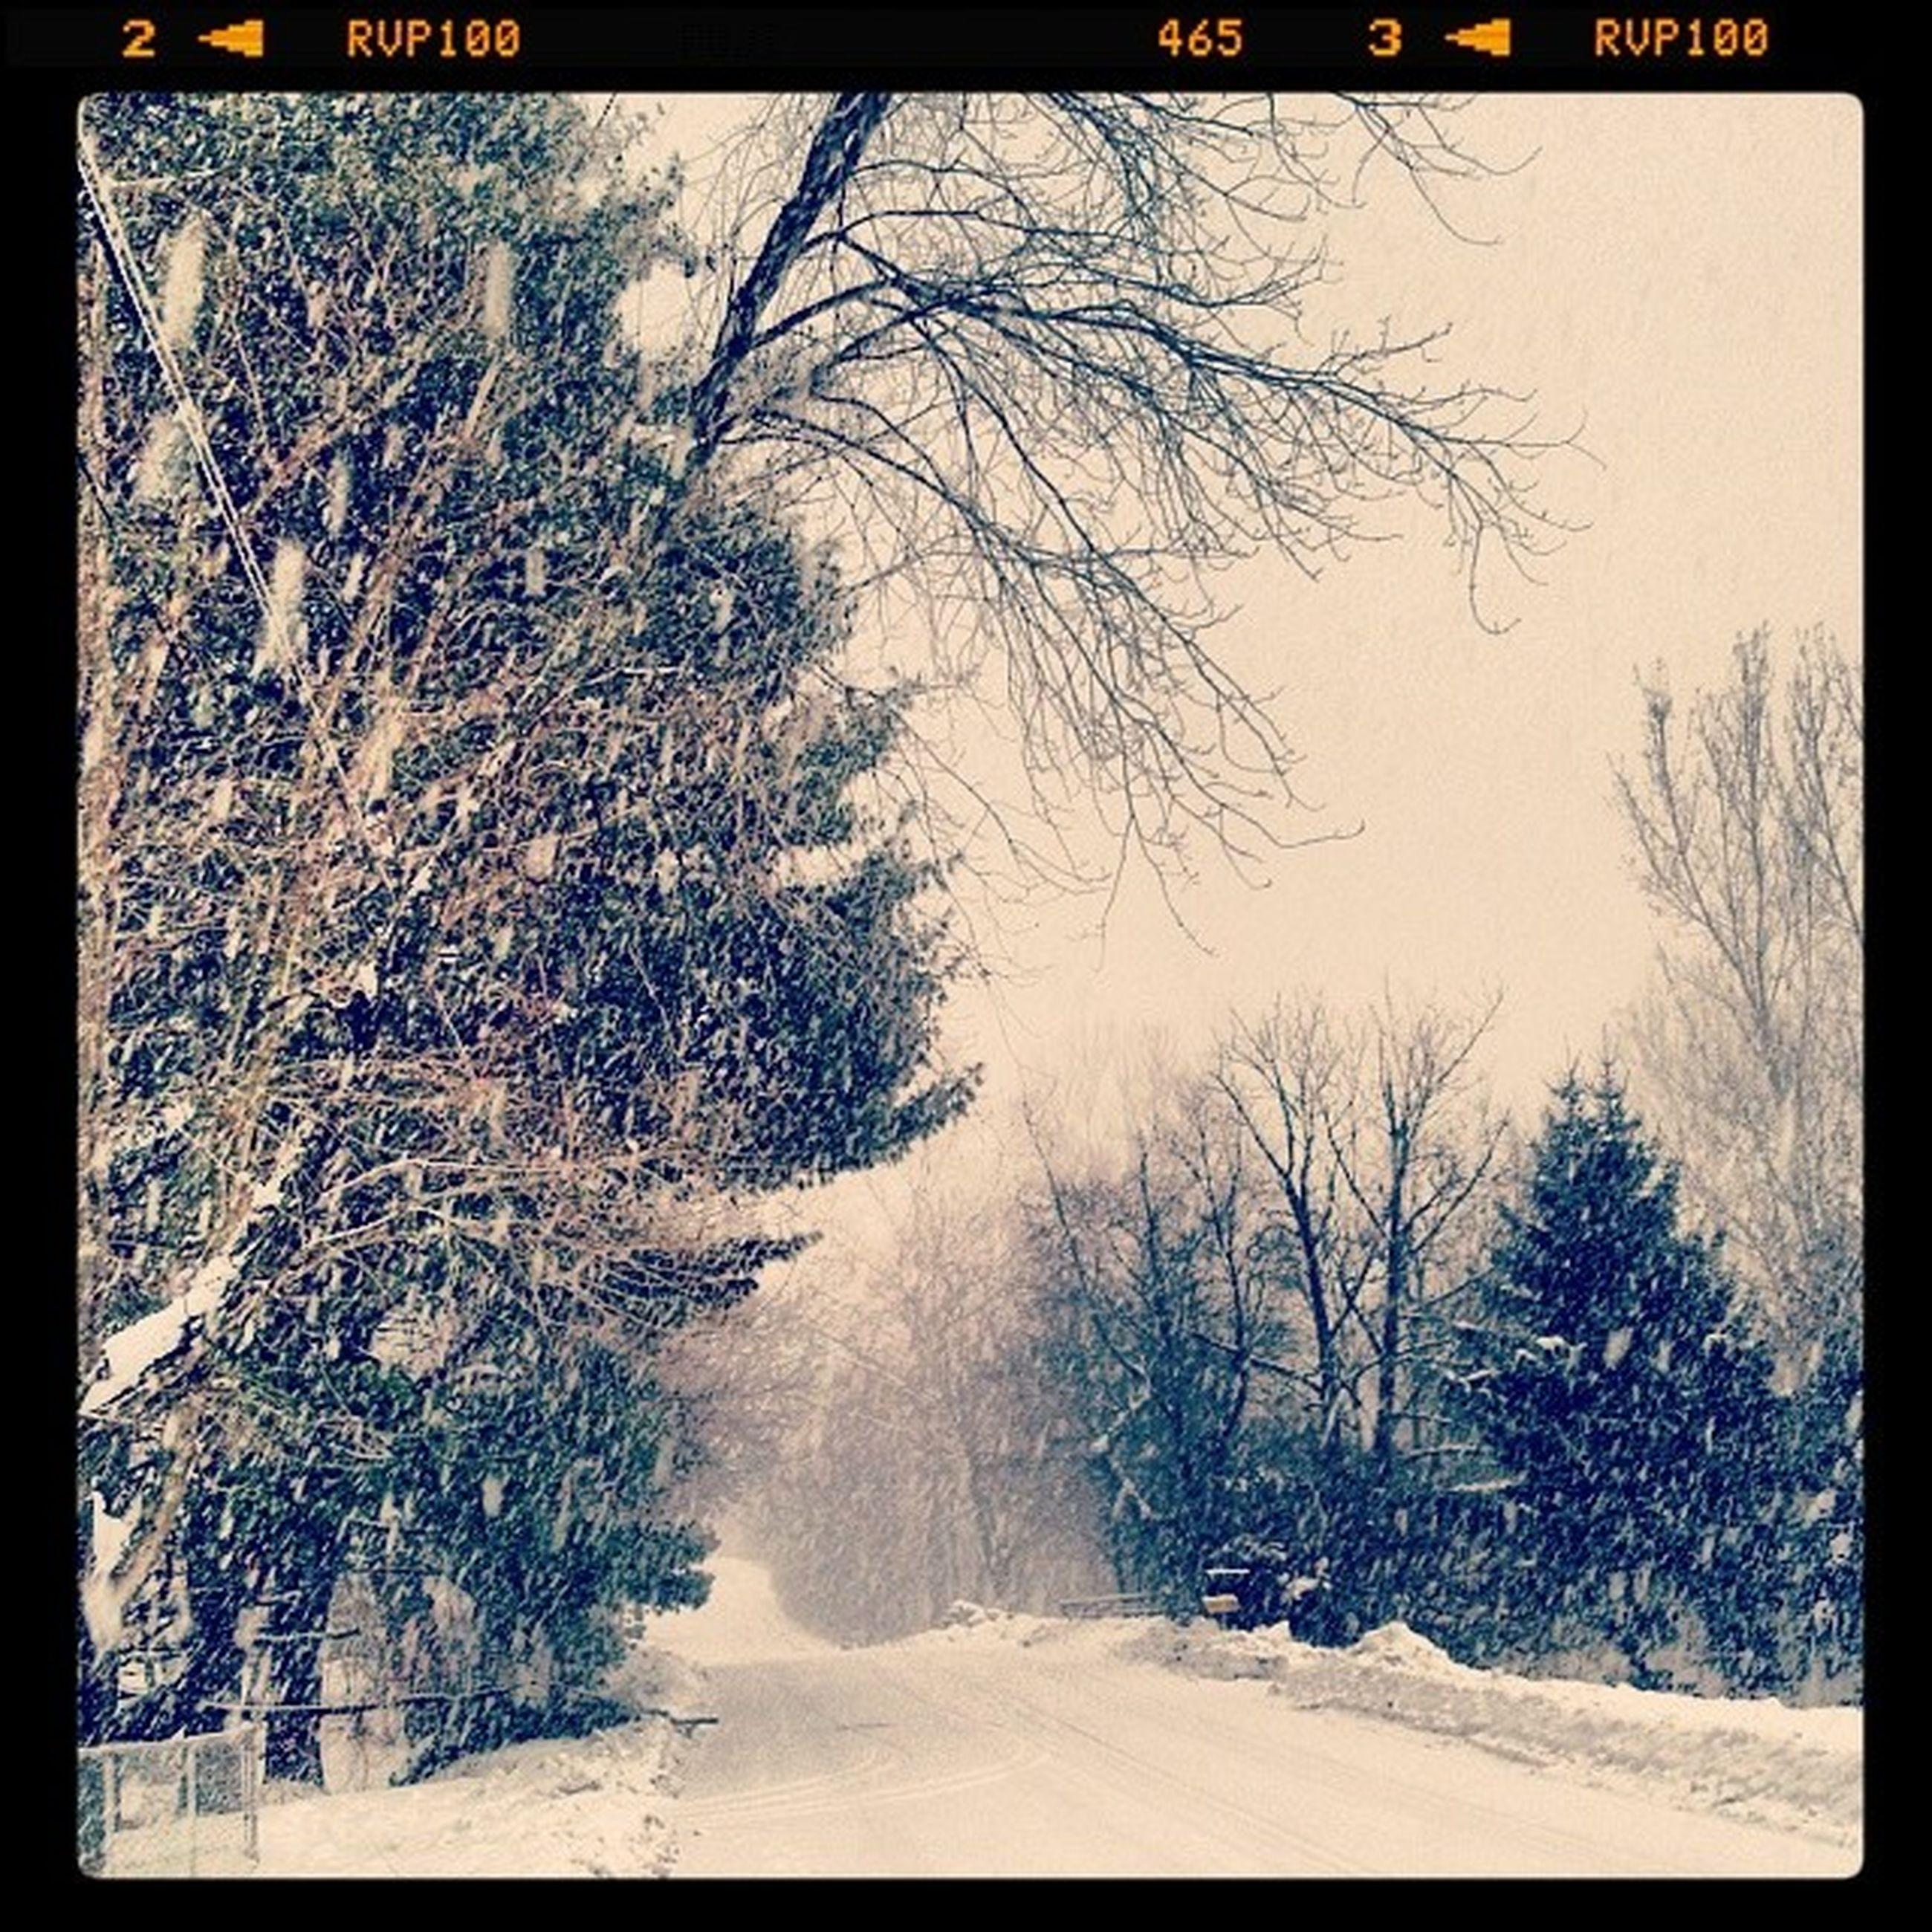 snow, winter, cold temperature, transfer print, tree, season, tranquility, auto post production filter, tranquil scene, bare tree, weather, scenics, nature, beauty in nature, branch, landscape, covering, frozen, field, non-urban scene